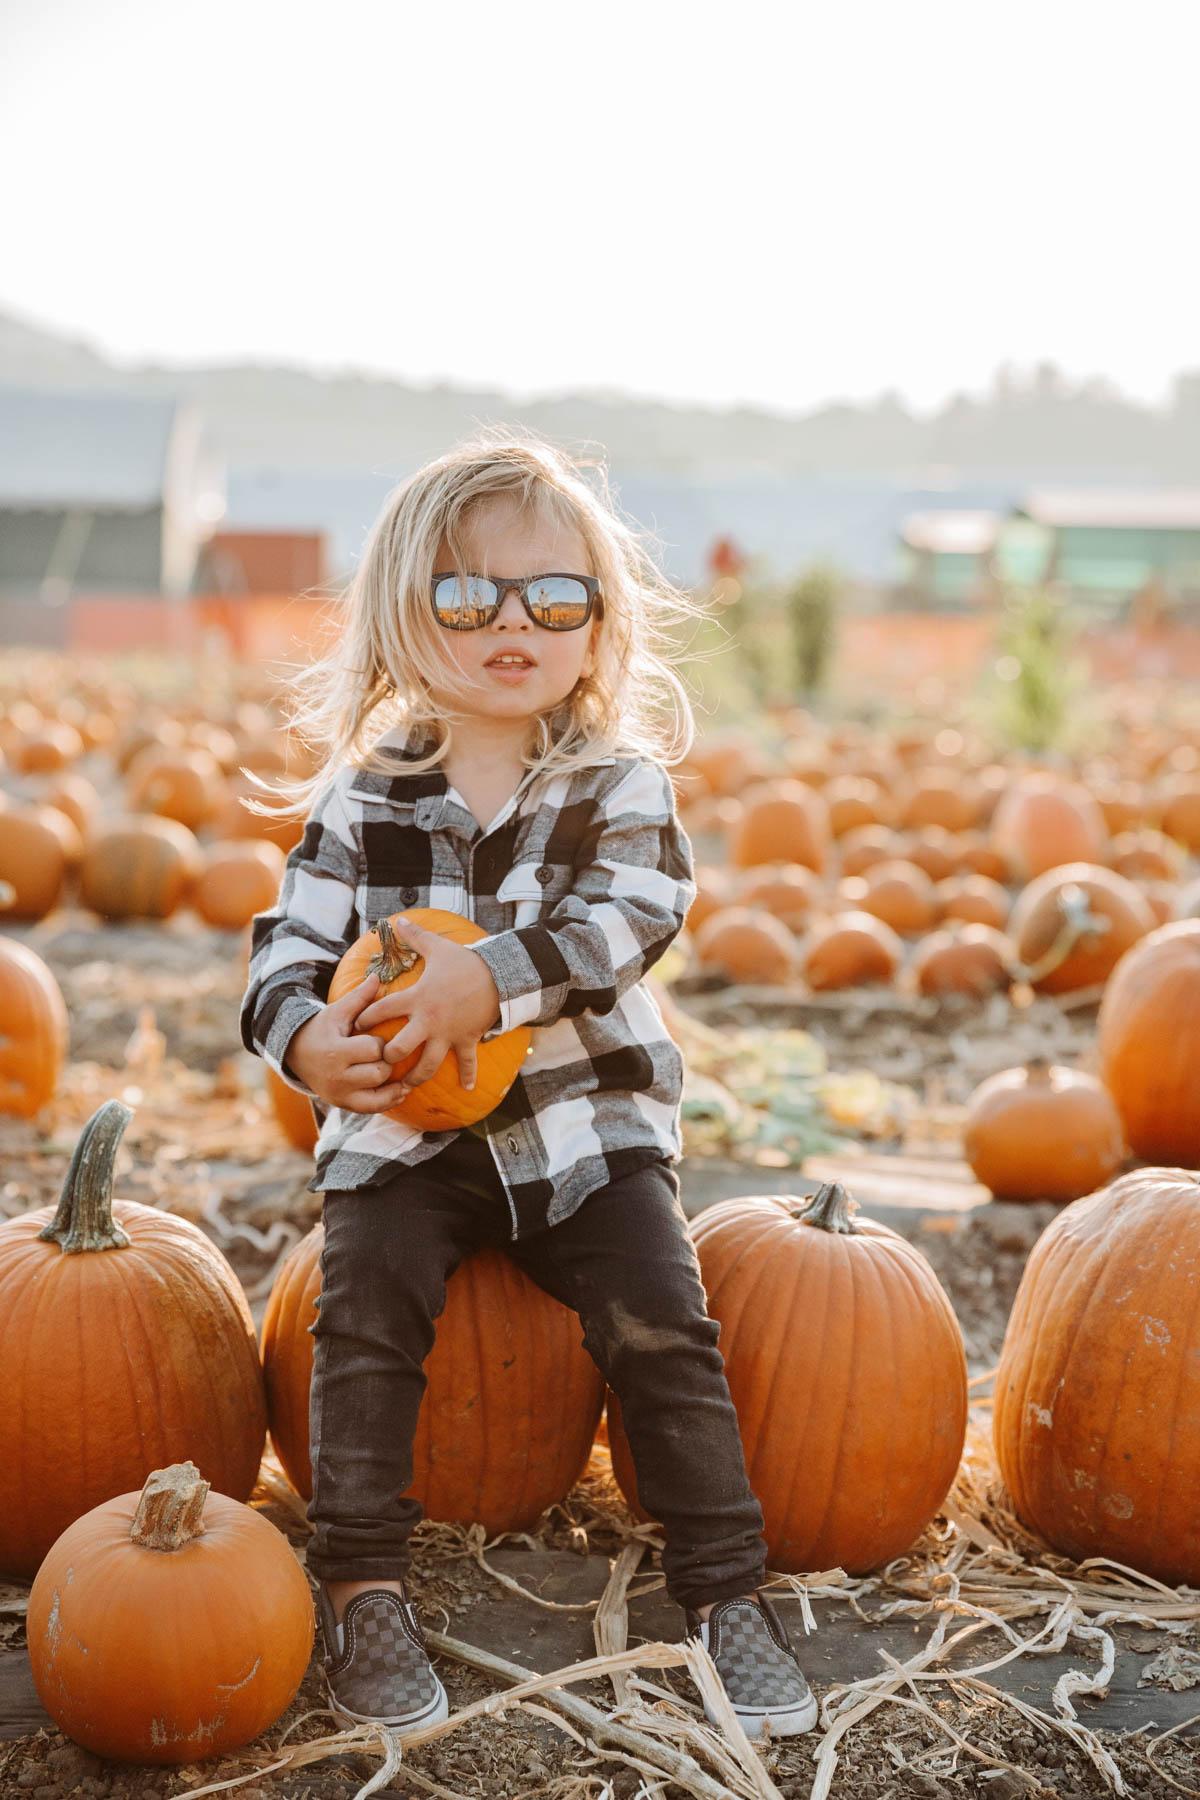 Pumpkin Patch Photo Shoot with Otis